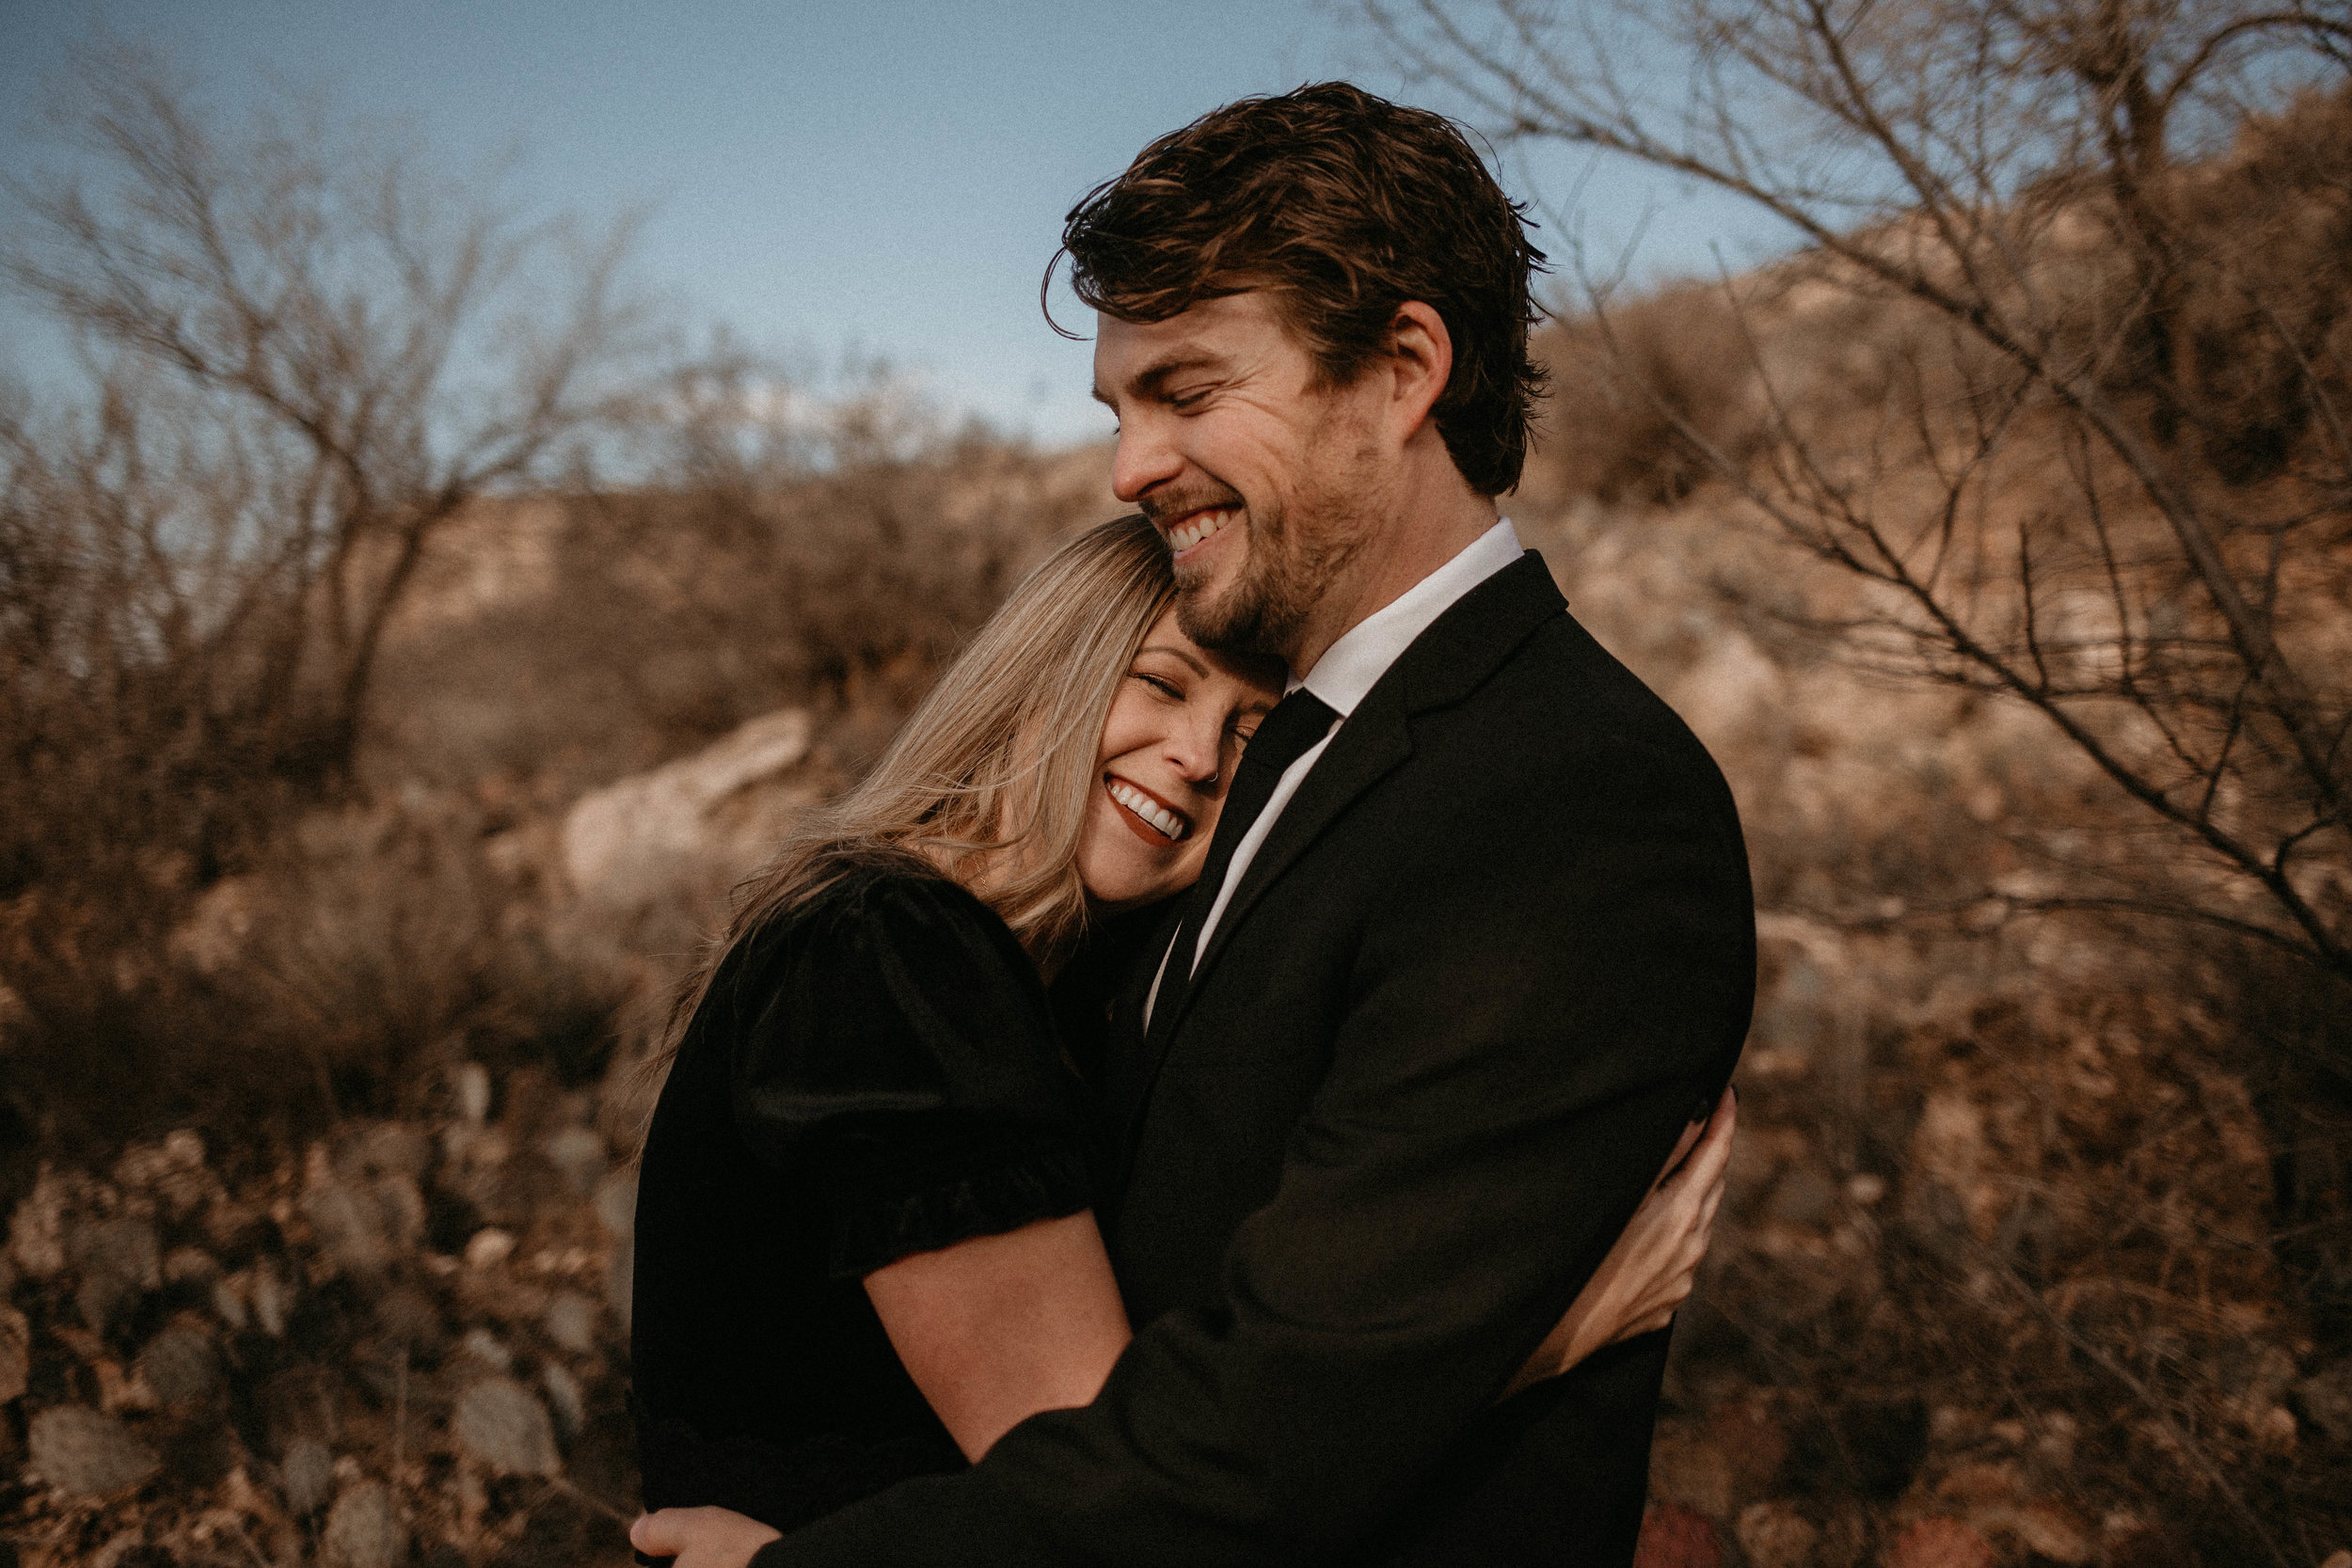 Lubbock Photographer | Lubbock Wedding Photographer | Kailee Ann Photography